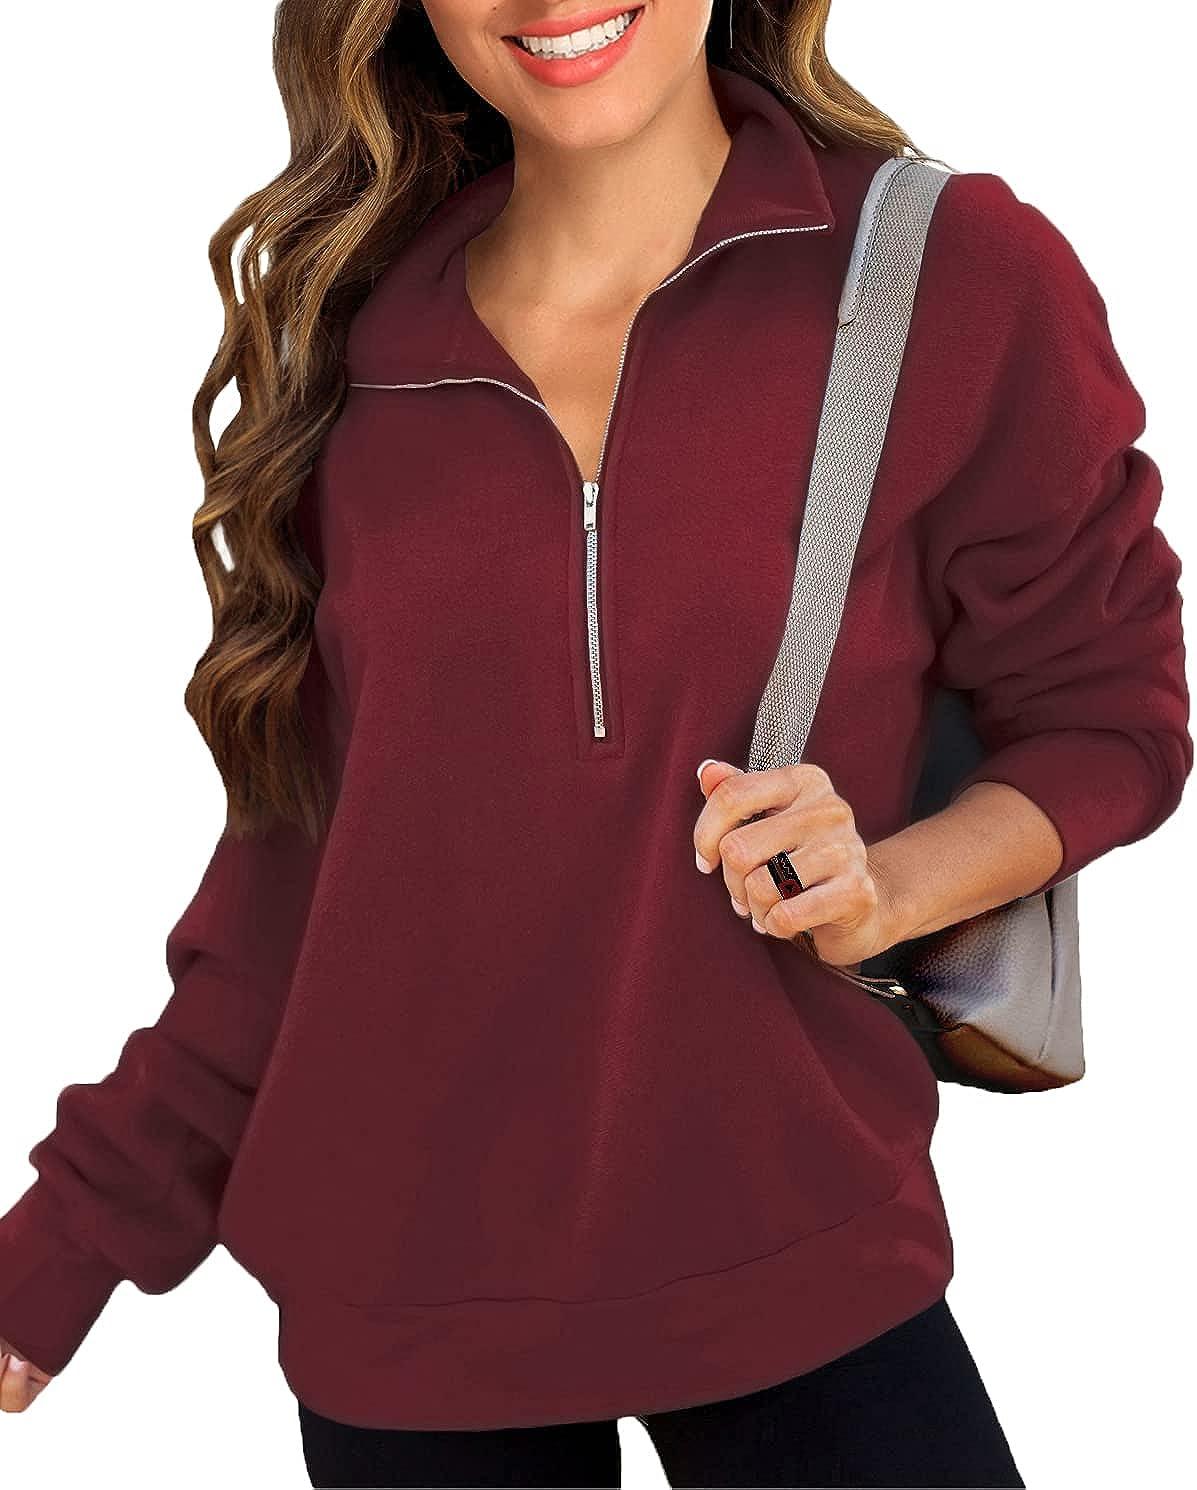 Halife Women's Casual Long Sleeve Lapel Zipper Sweatshirt Solid Loose Collar Pullover Tops